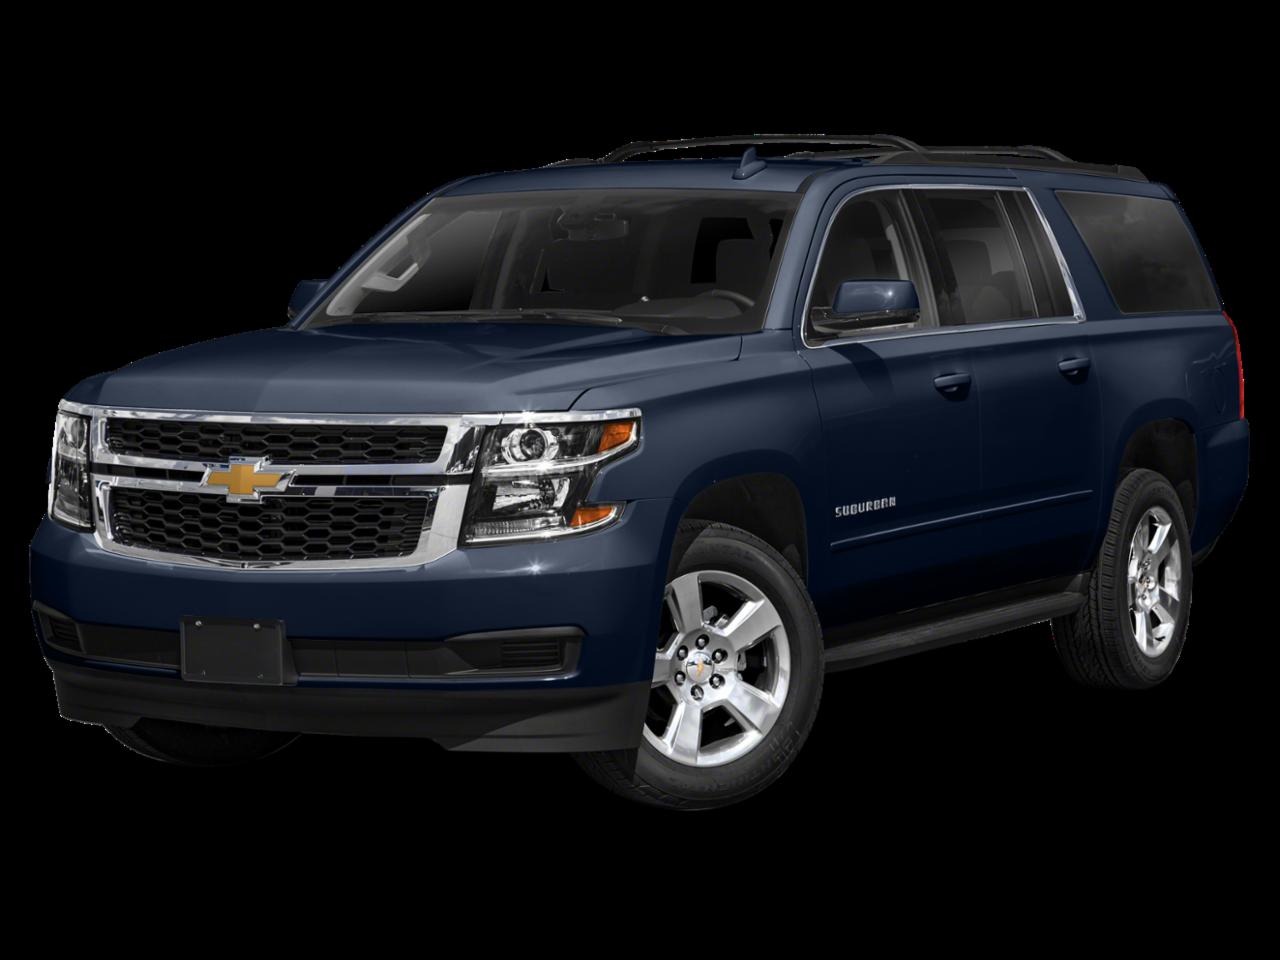 Chevrolet 2019 Suburban Commercial